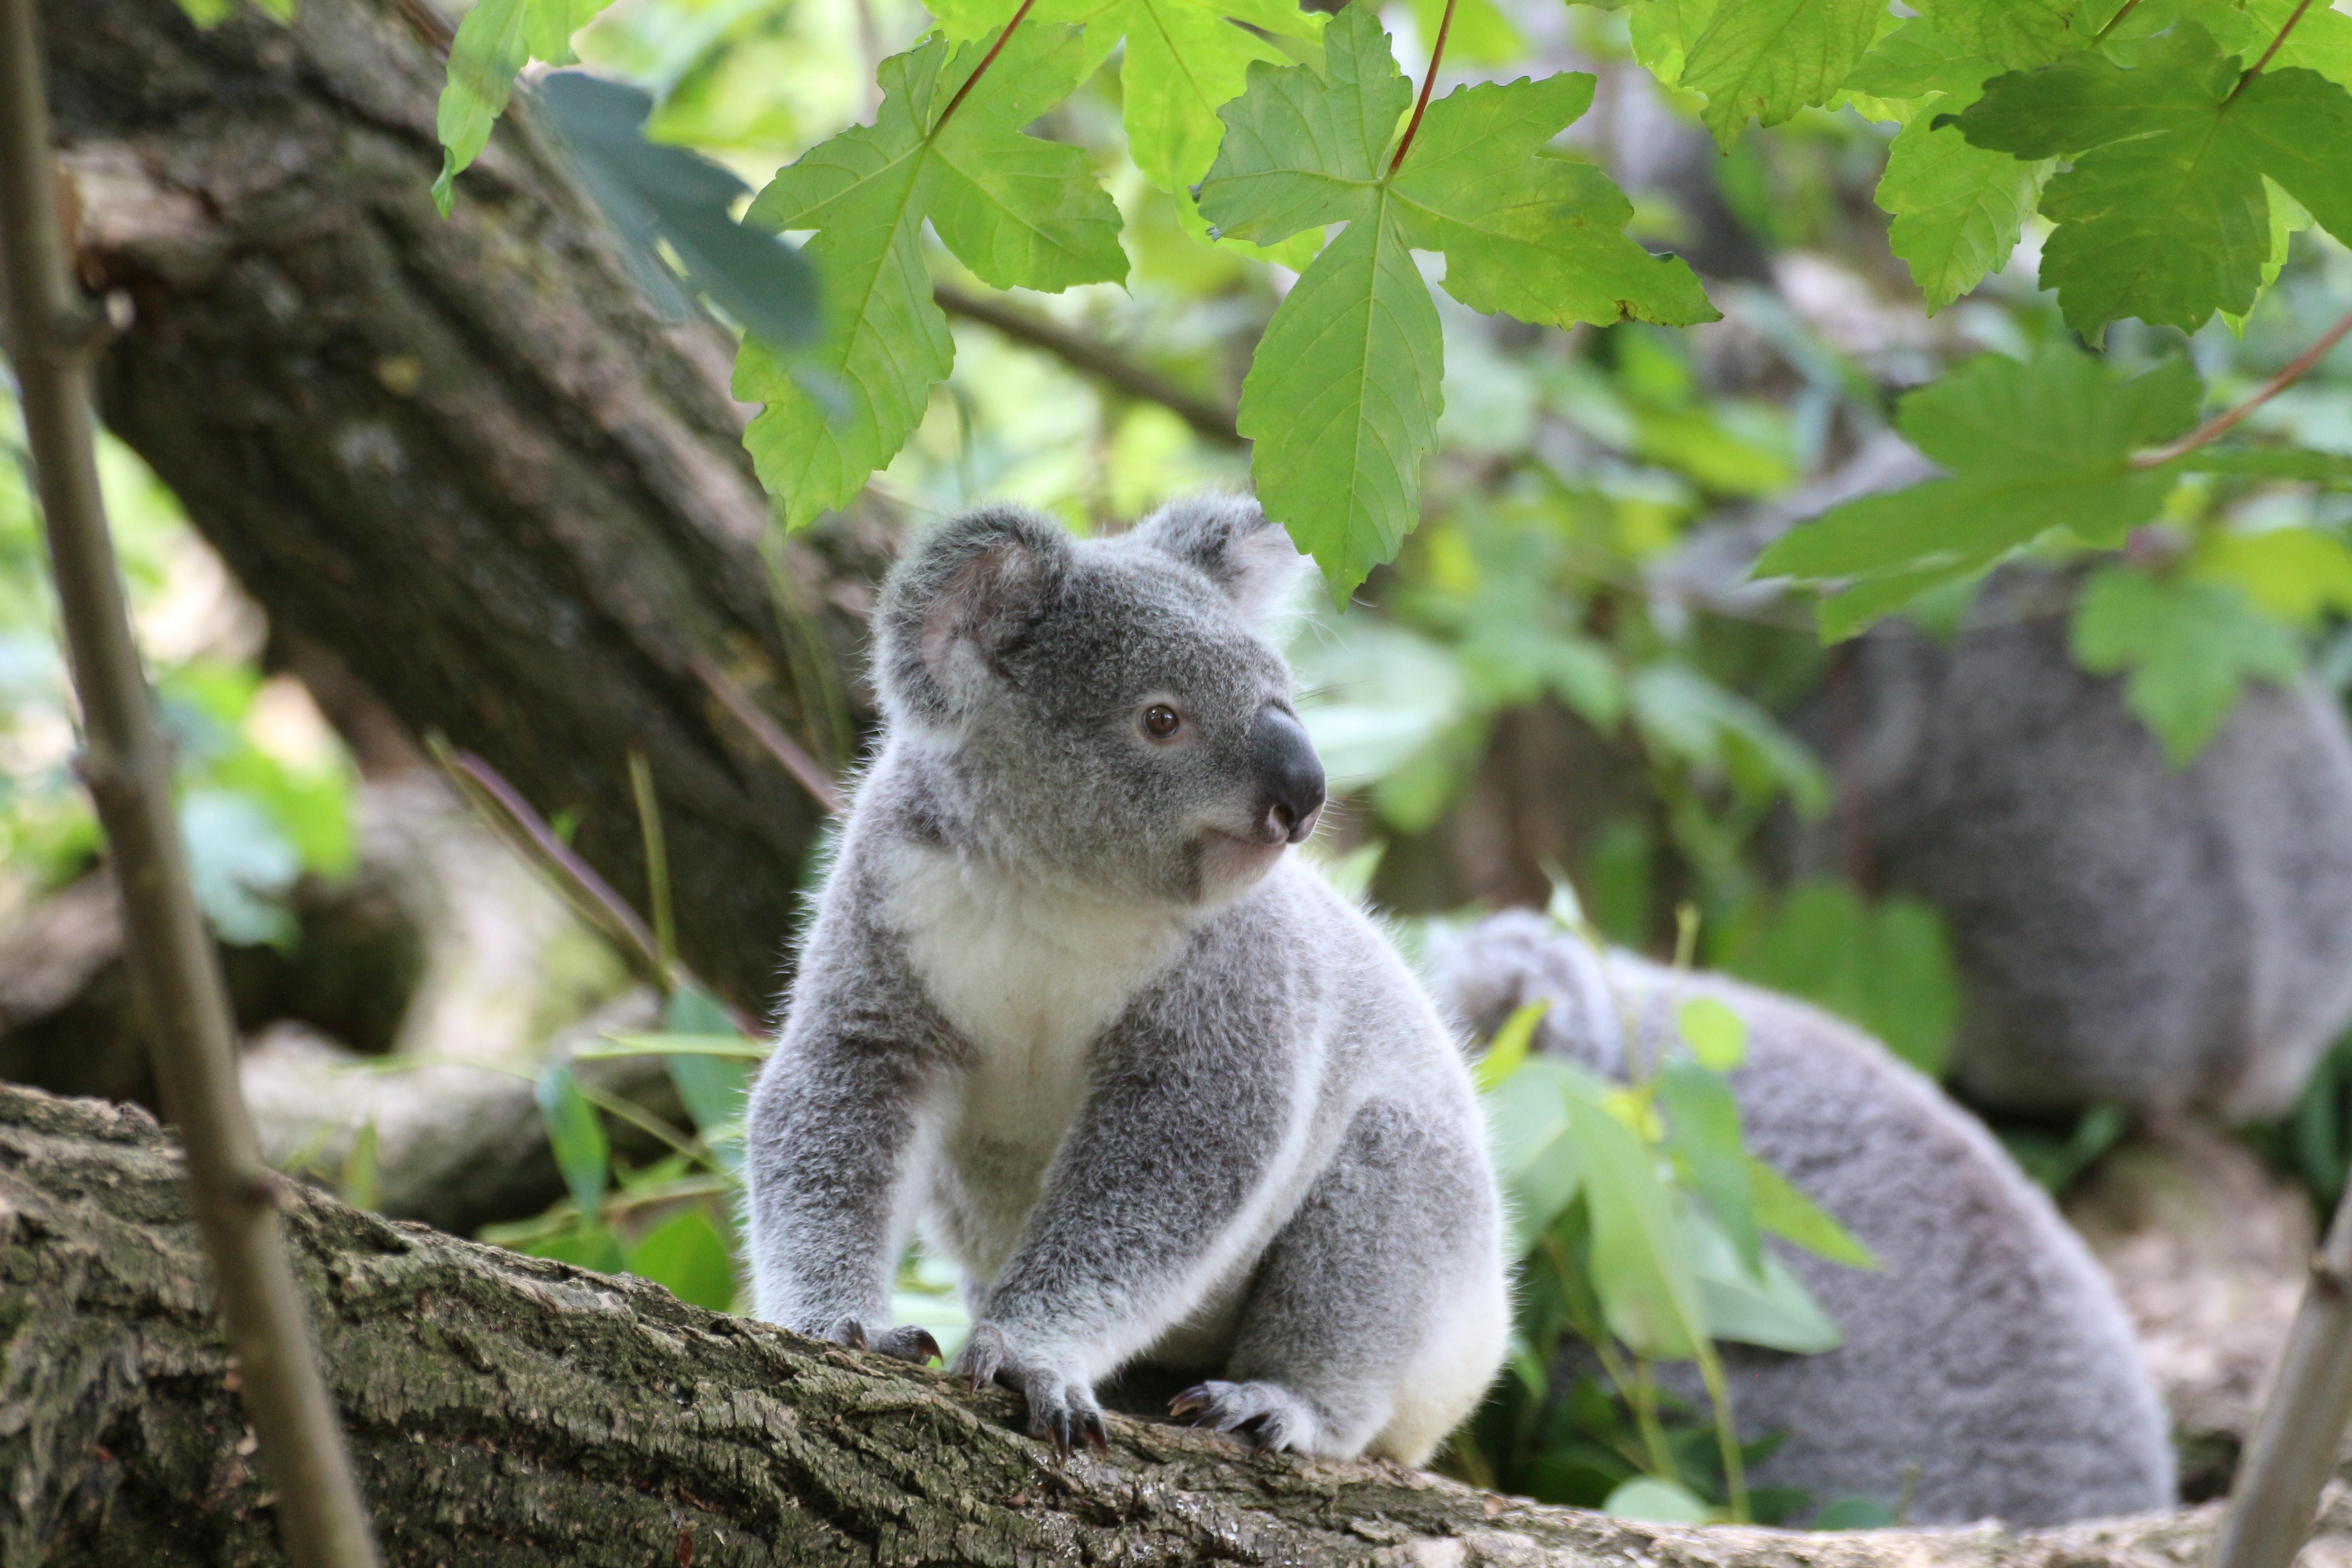 Koala Bear on Grey Wood Trunk on Daytime, Animal, Primate, Young, Wood, HQ Photo